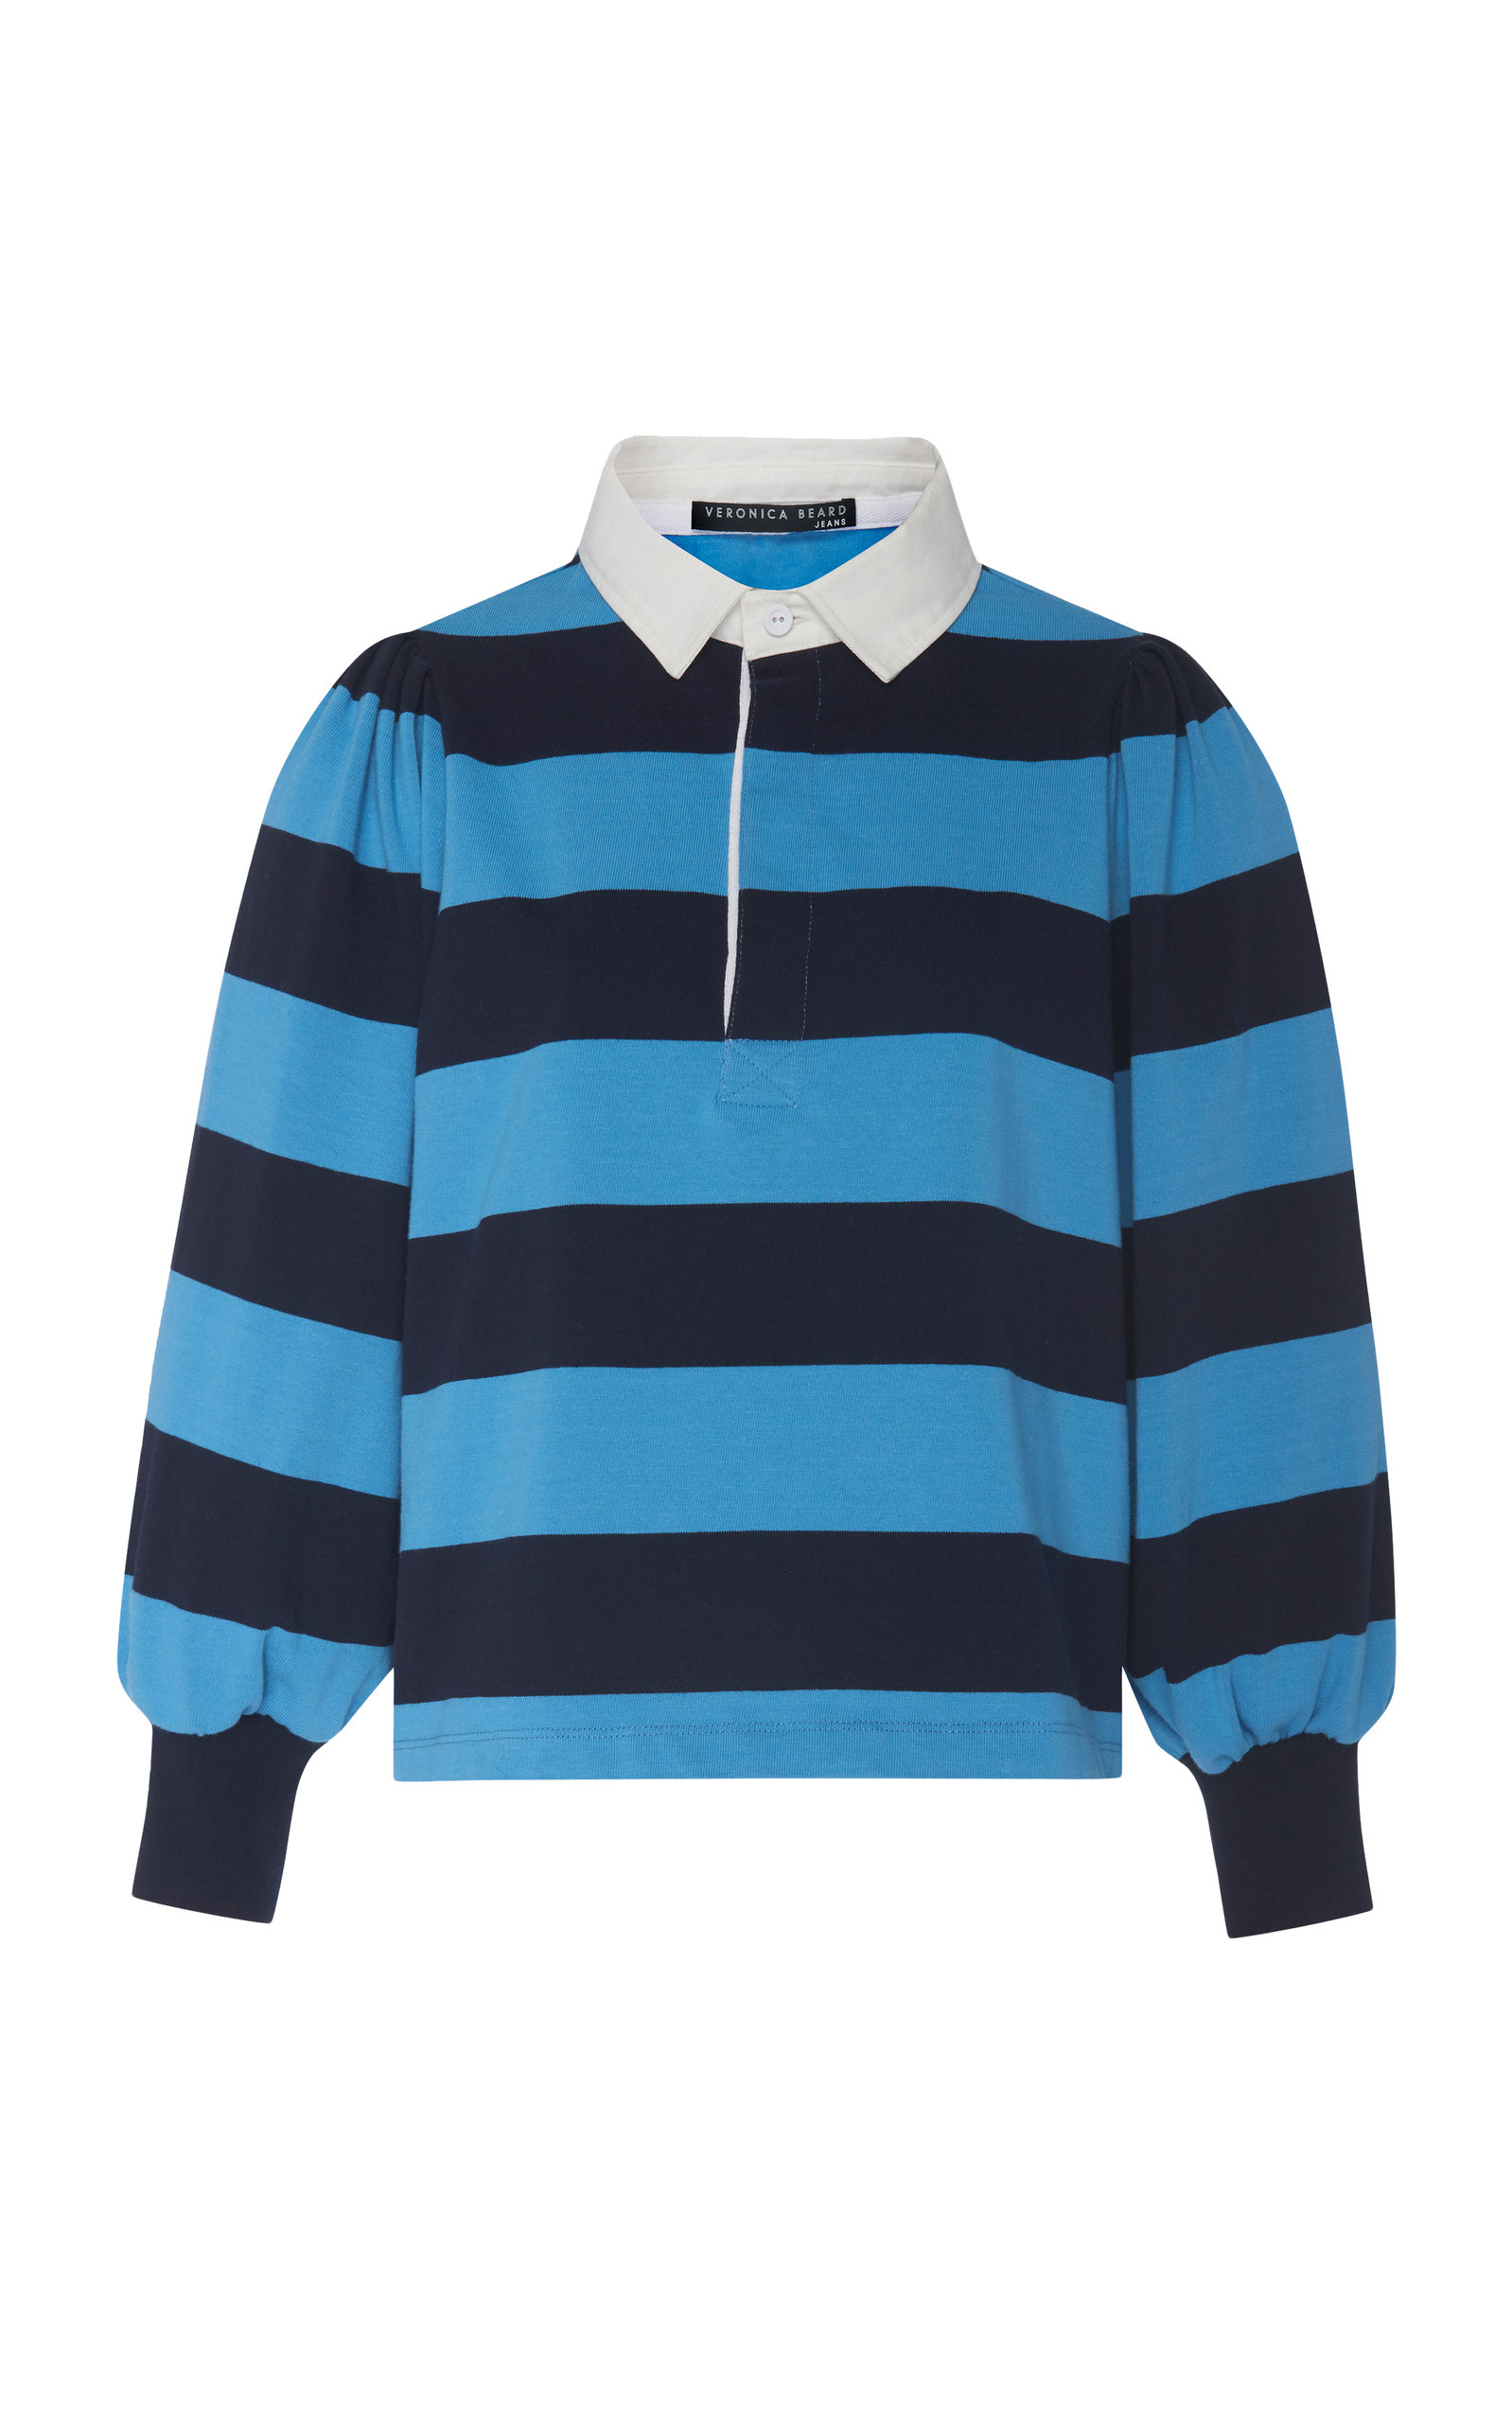 Presto Cotton Rugby Tee in Blue